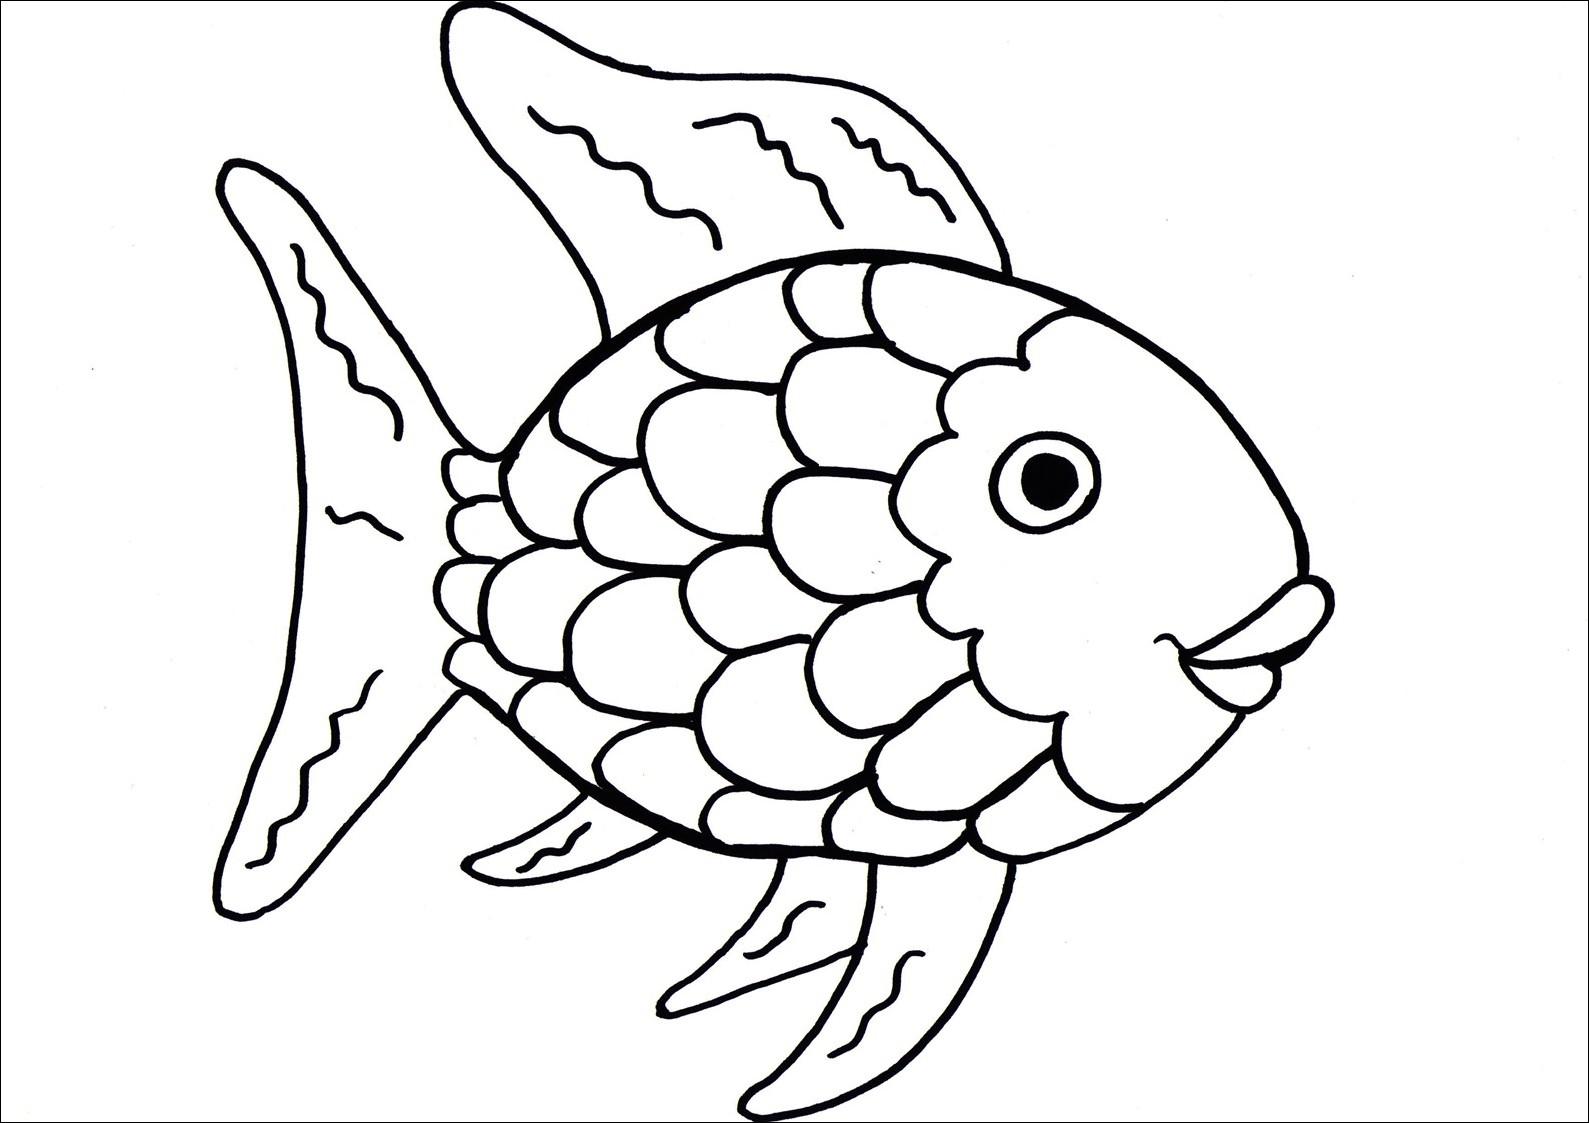 13 mewarnai gambar ikan